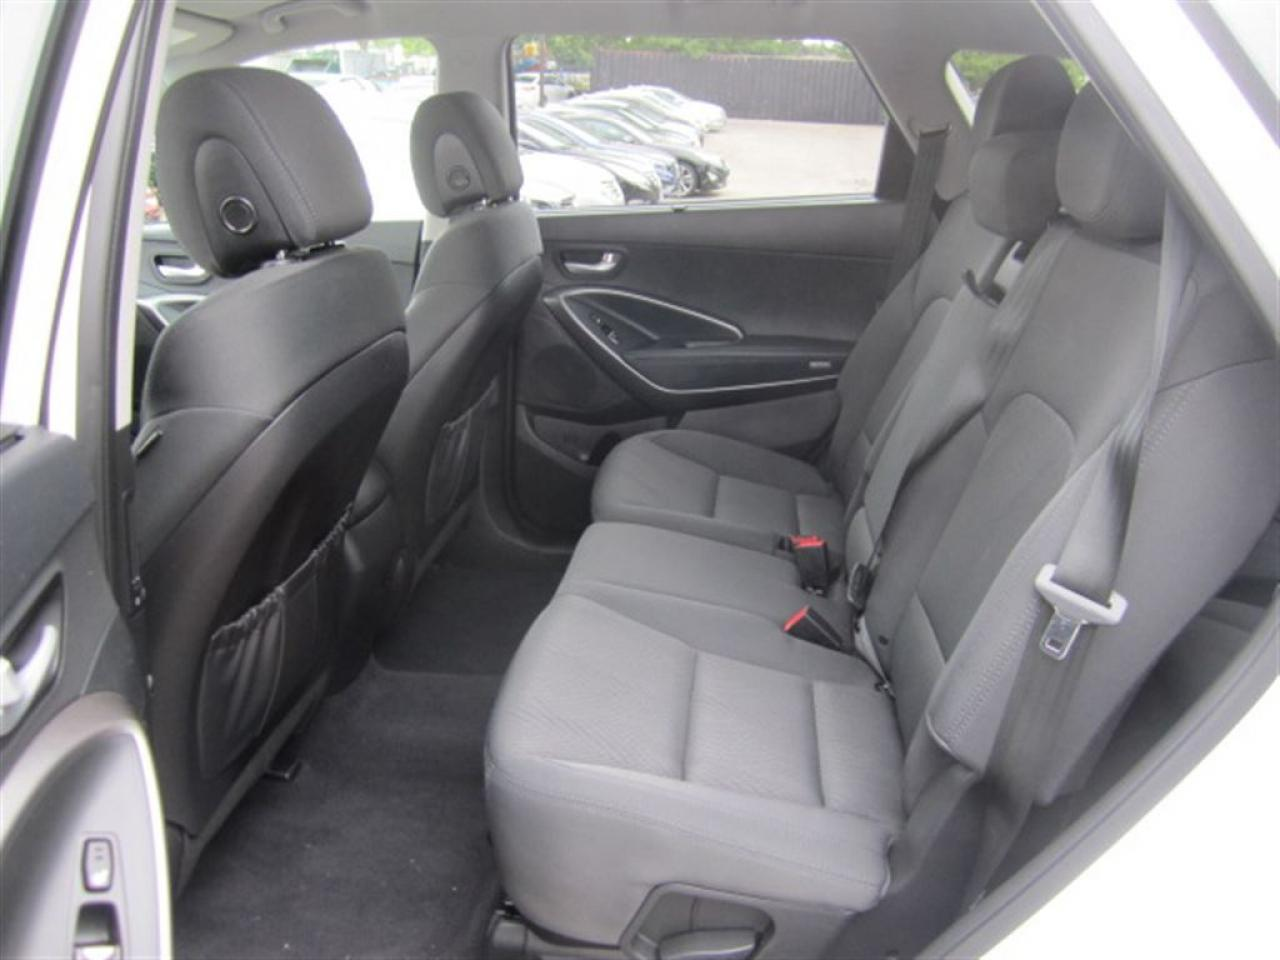 2017 Hyundai Santa Fe XL Premium-AWD-Push start-Rear Camera